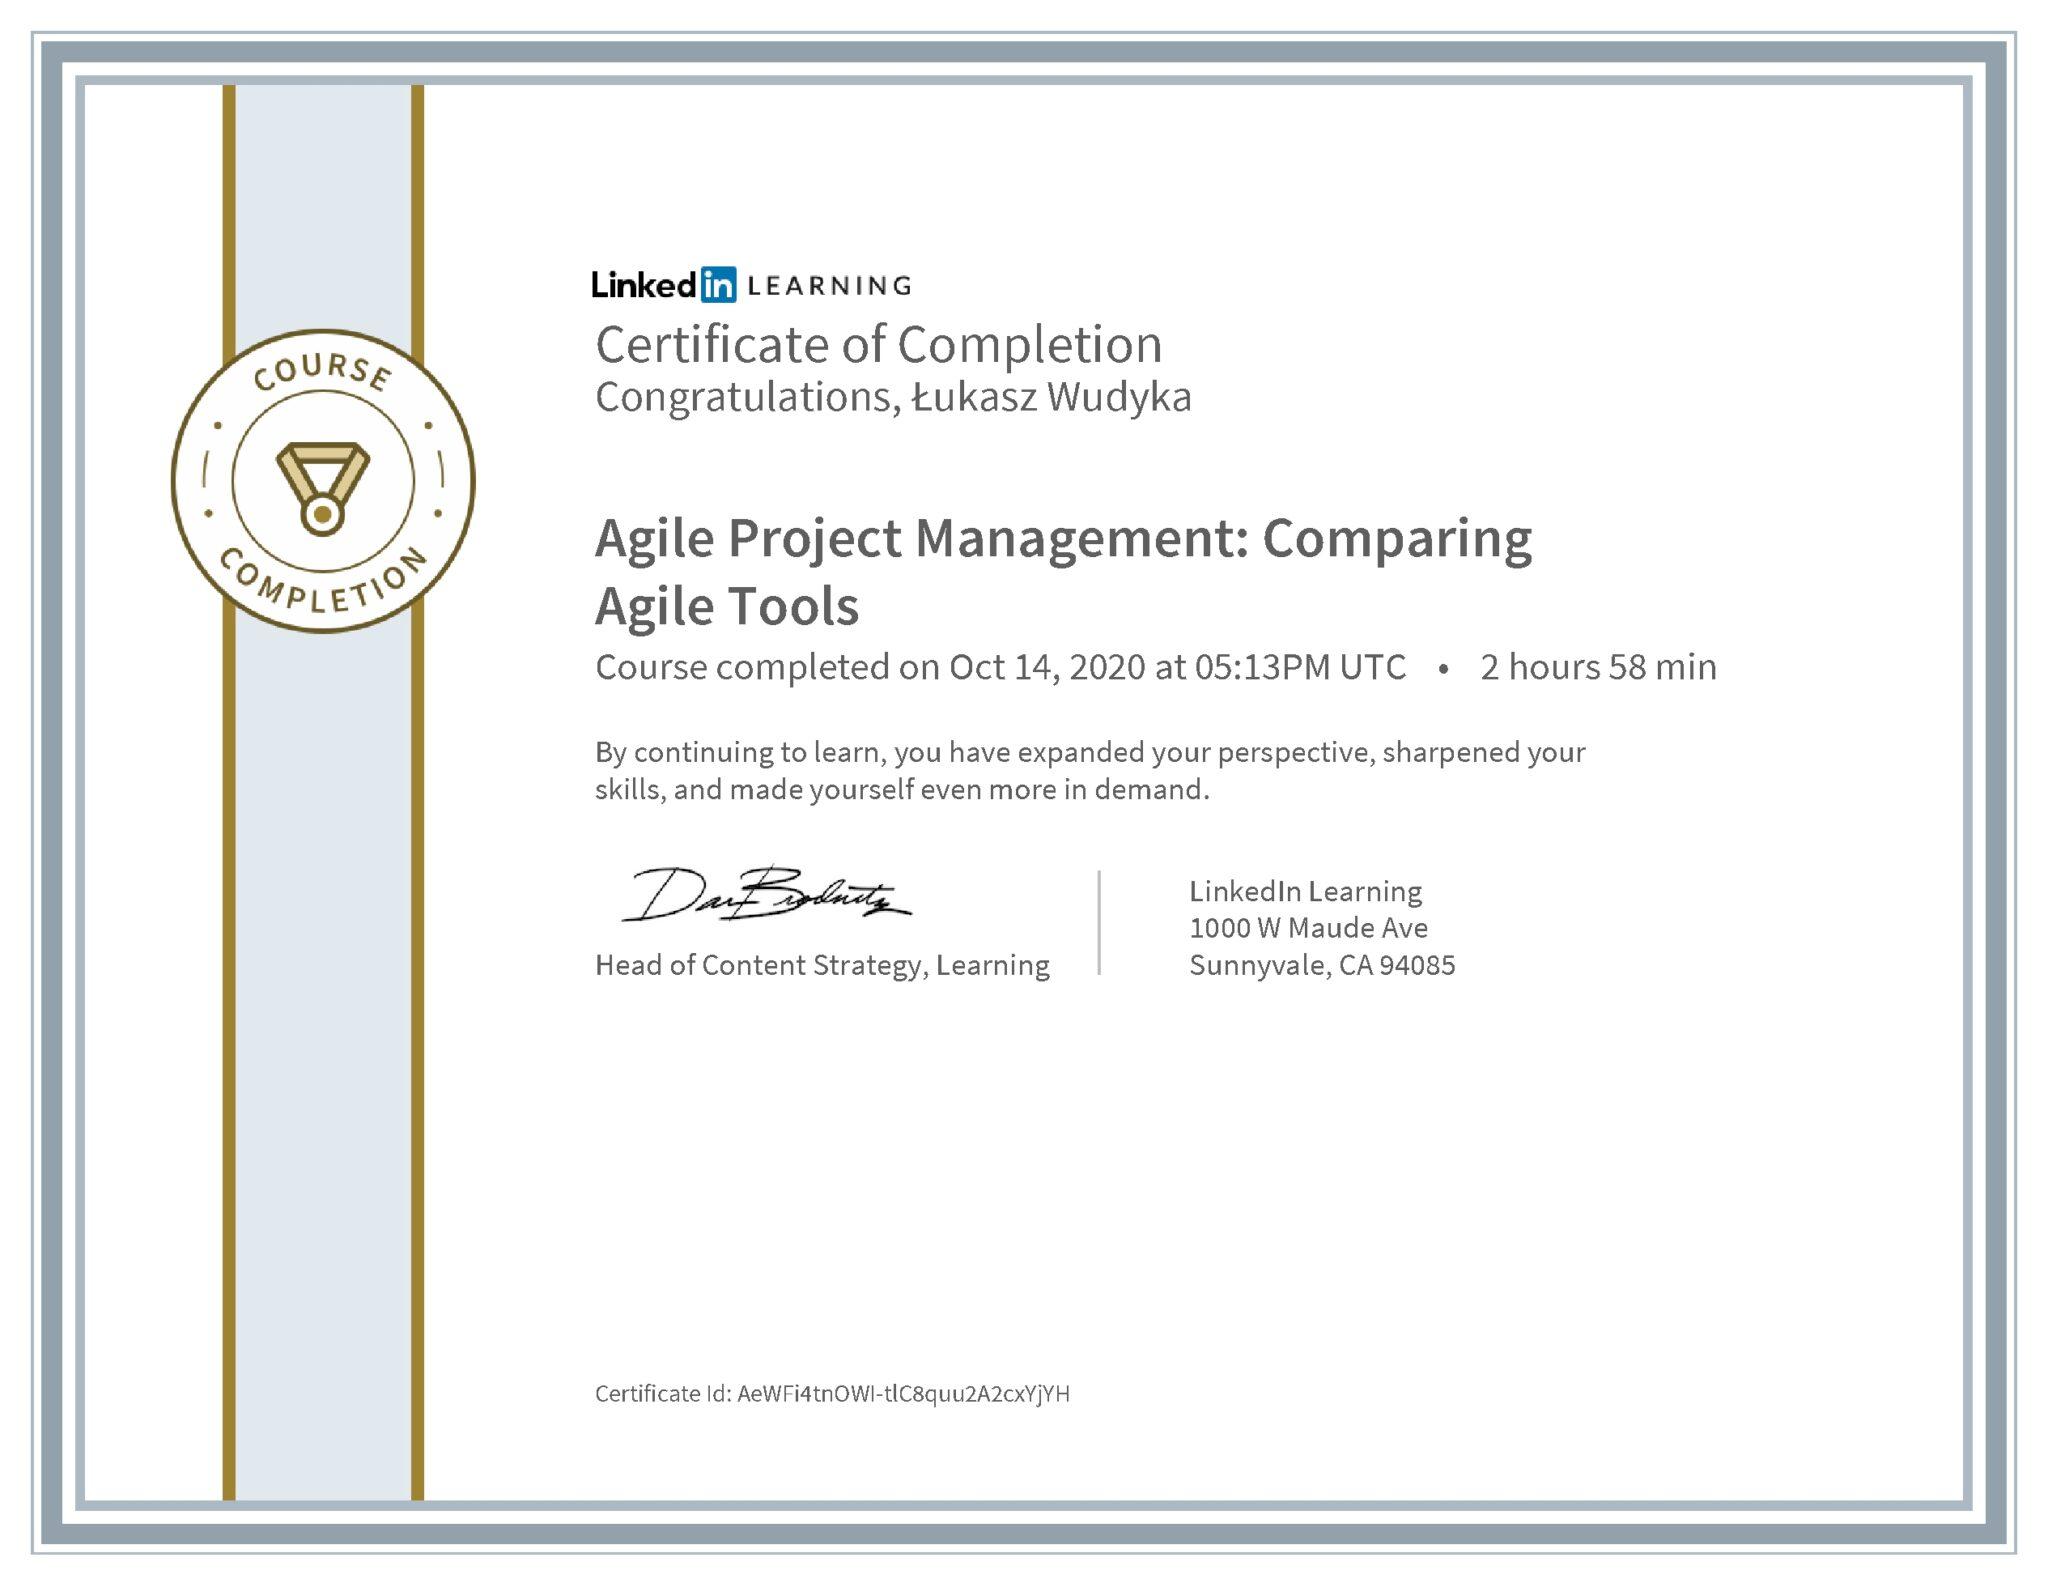 Łukasz Wudyka certyfikat LinkedIn Agile Project Management: Comparing Agile Tools